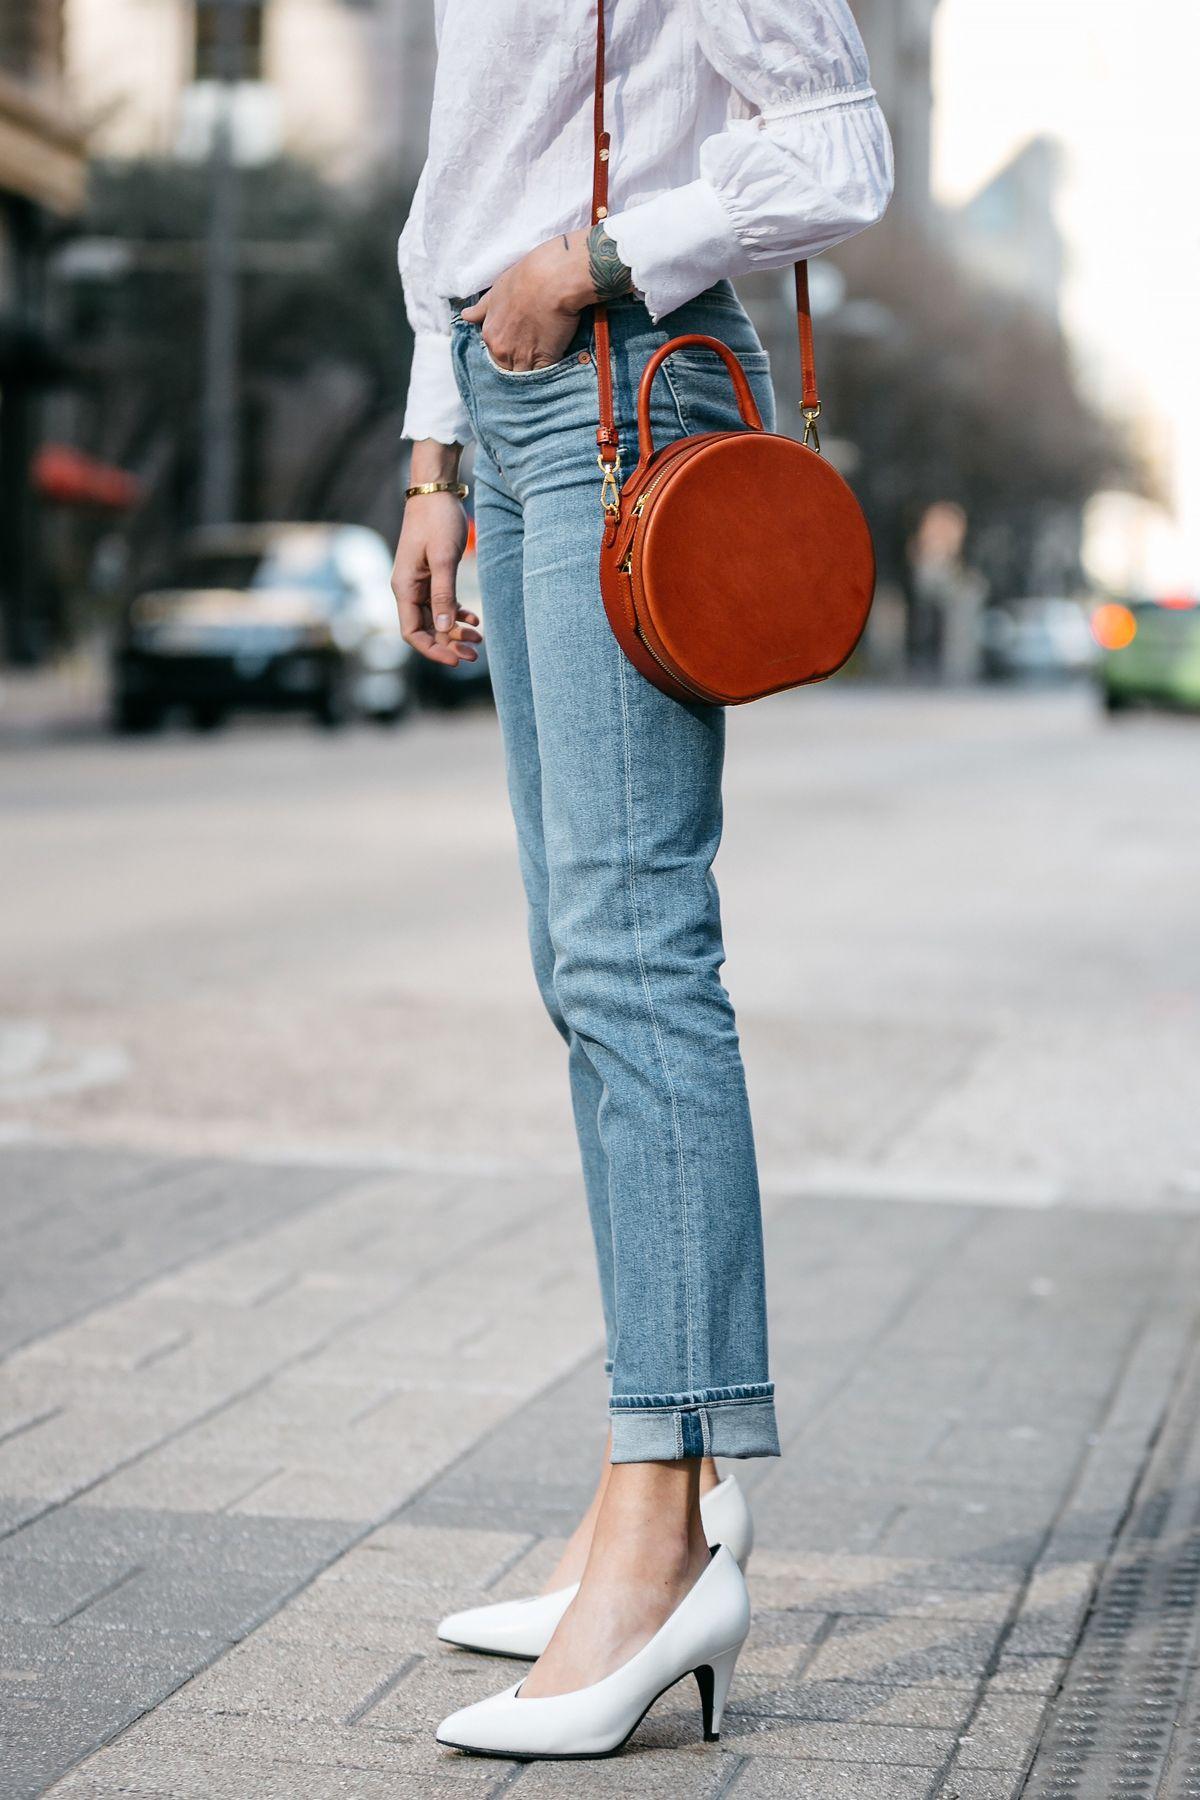 Woman Wearing Relaxed Denim Jeans Mansur Gavriel Circle Bag White Pumps  Fashion Jackson Dallas Blogger Fashion Blogger Street Style 0c4052fda9c62